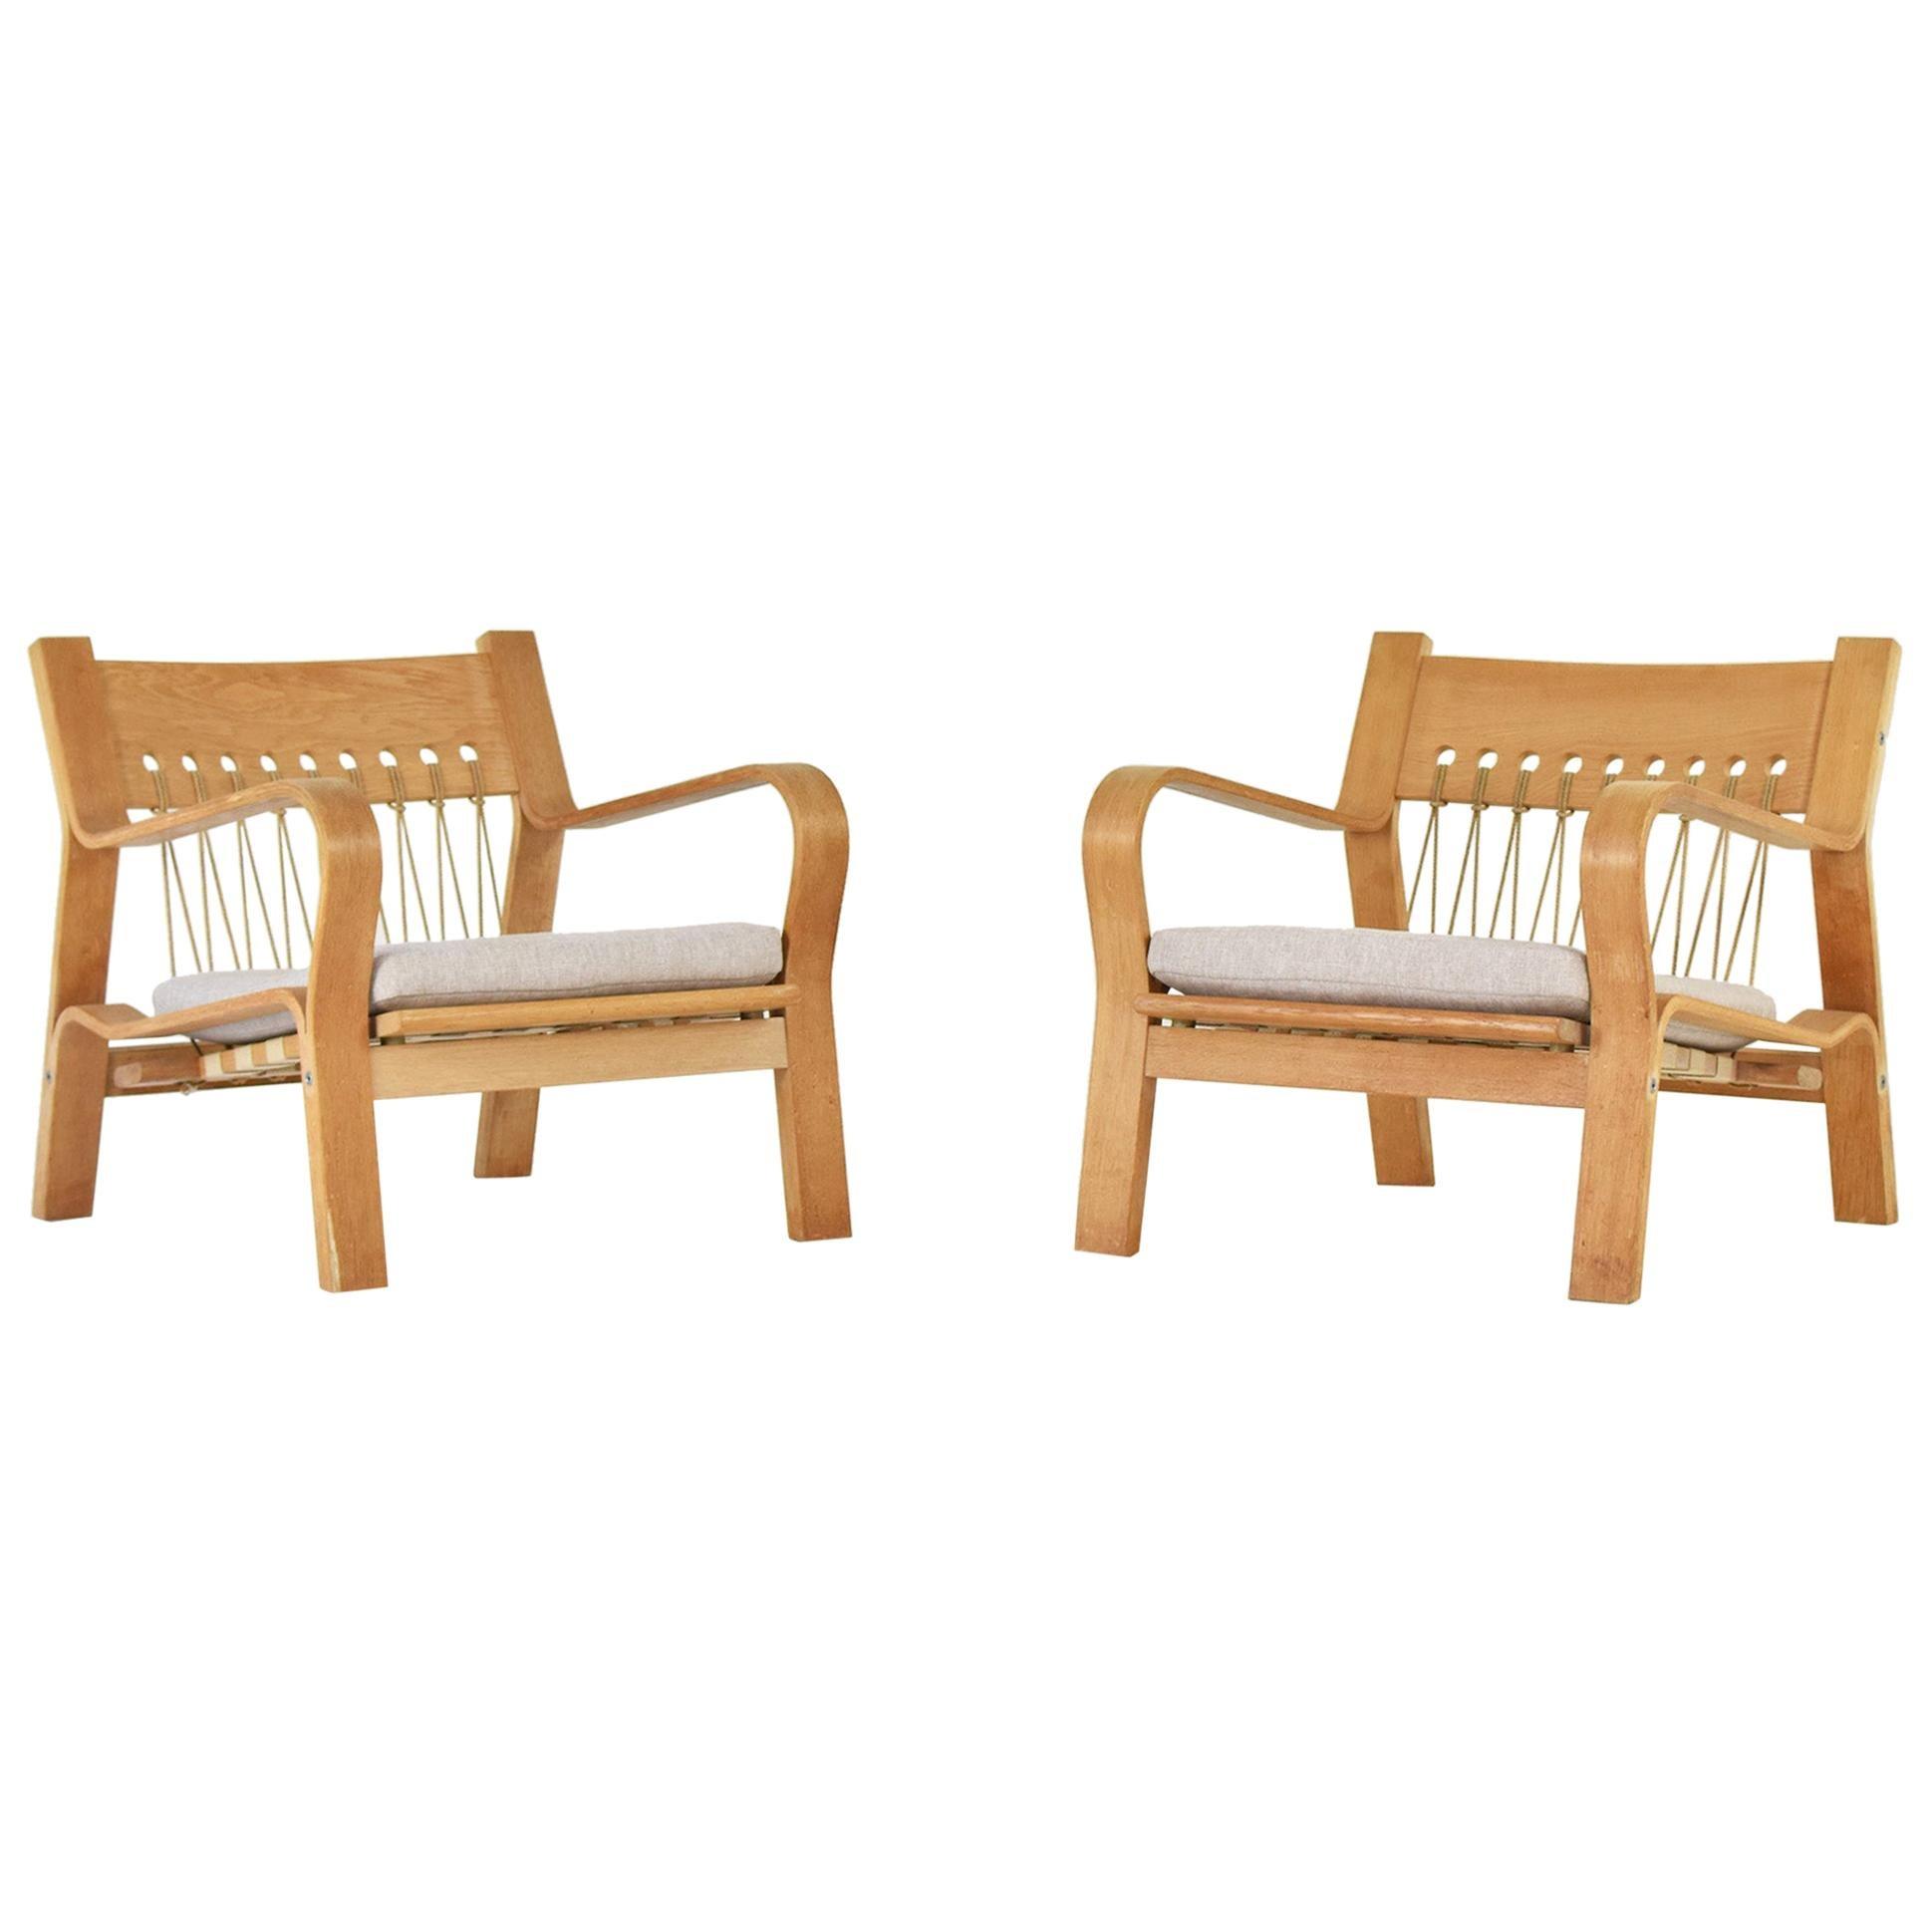 Pair of GE 671 Easy Chairs by Hans Wegner for GETAMA, Denmark, 1967